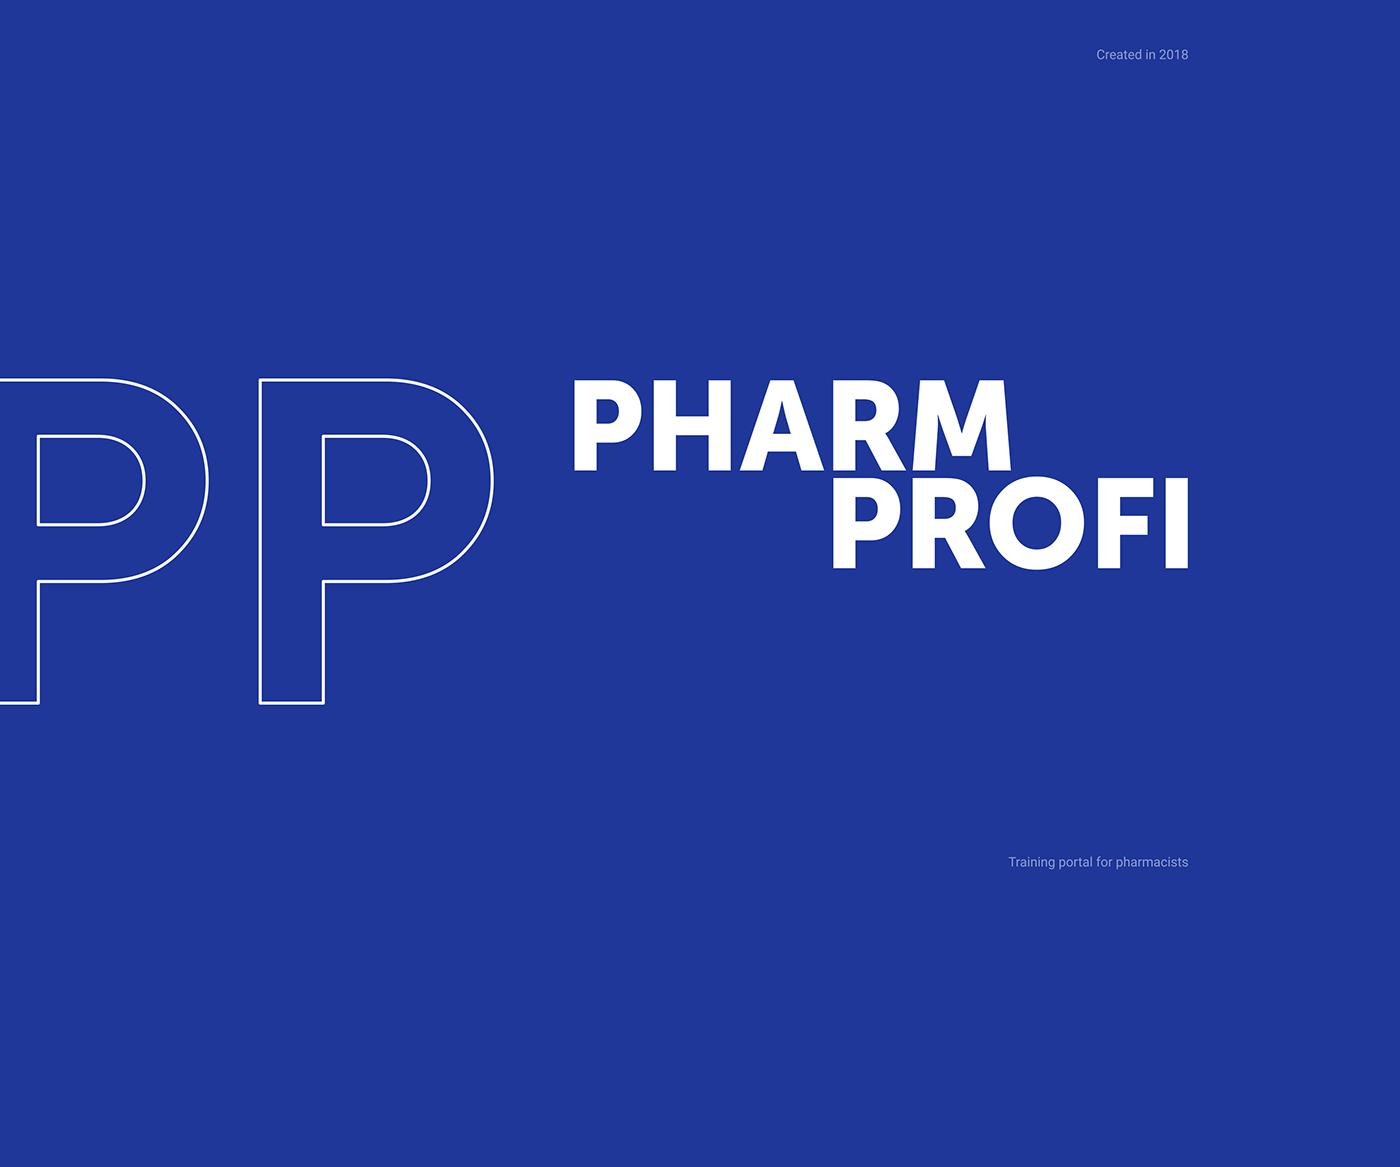 Pharmaceuticals portal uducation training UI ux interactive wireframe Web blue